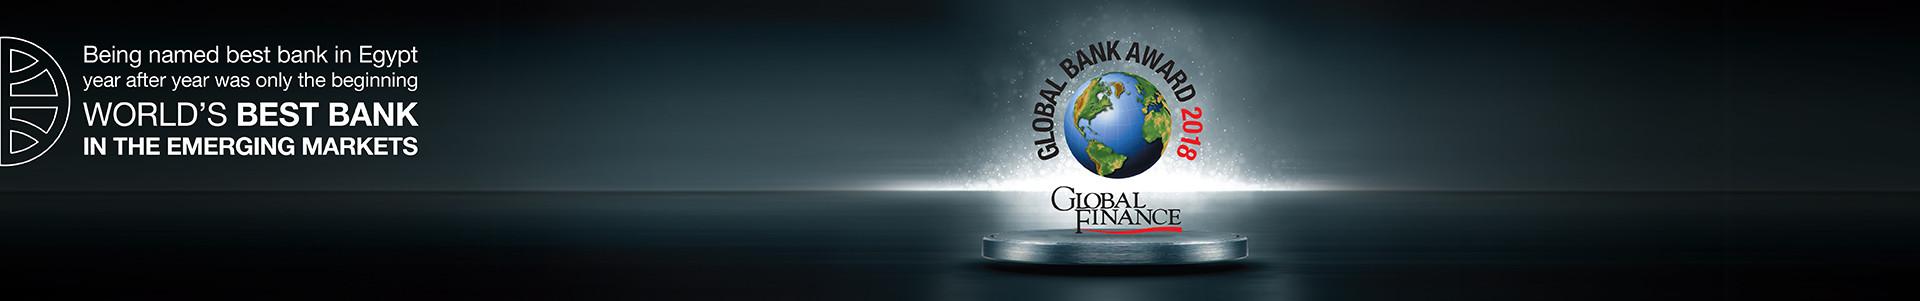 Commercial International Bank (CIB) Egypt - AnnualReports co uk